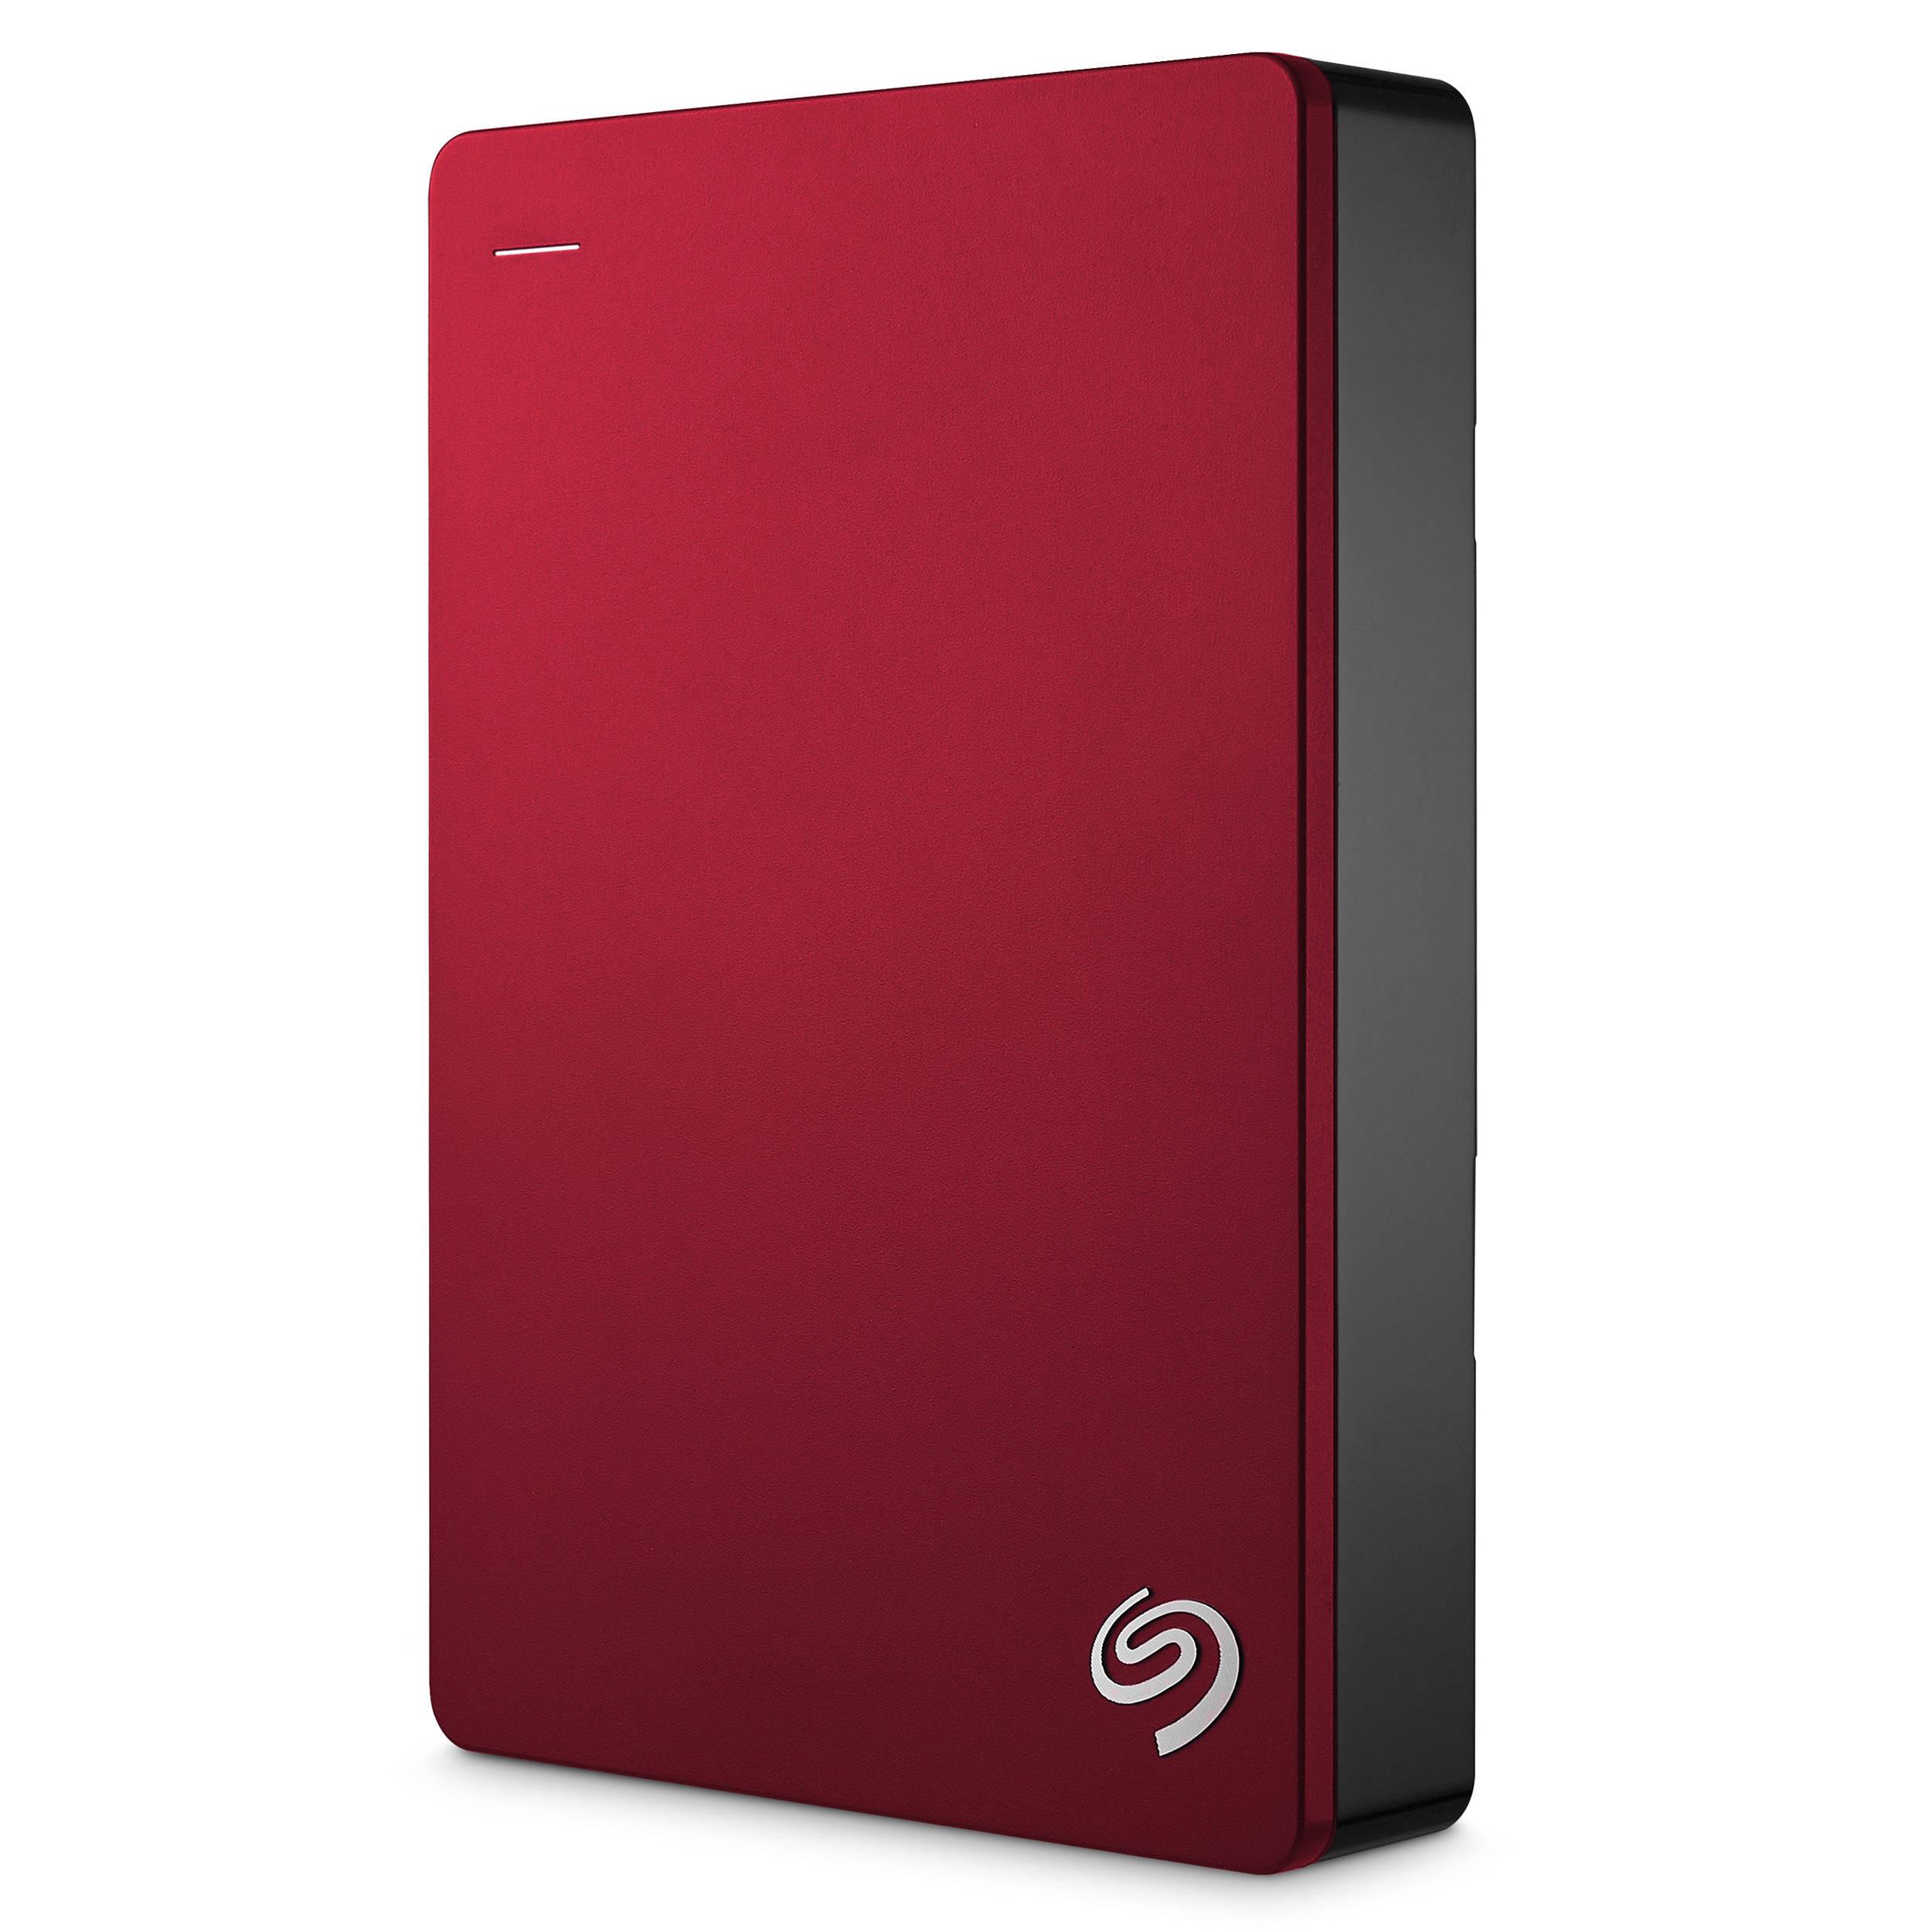 Seagate 5TB Backup Plus Portable Hard Drive (Red)